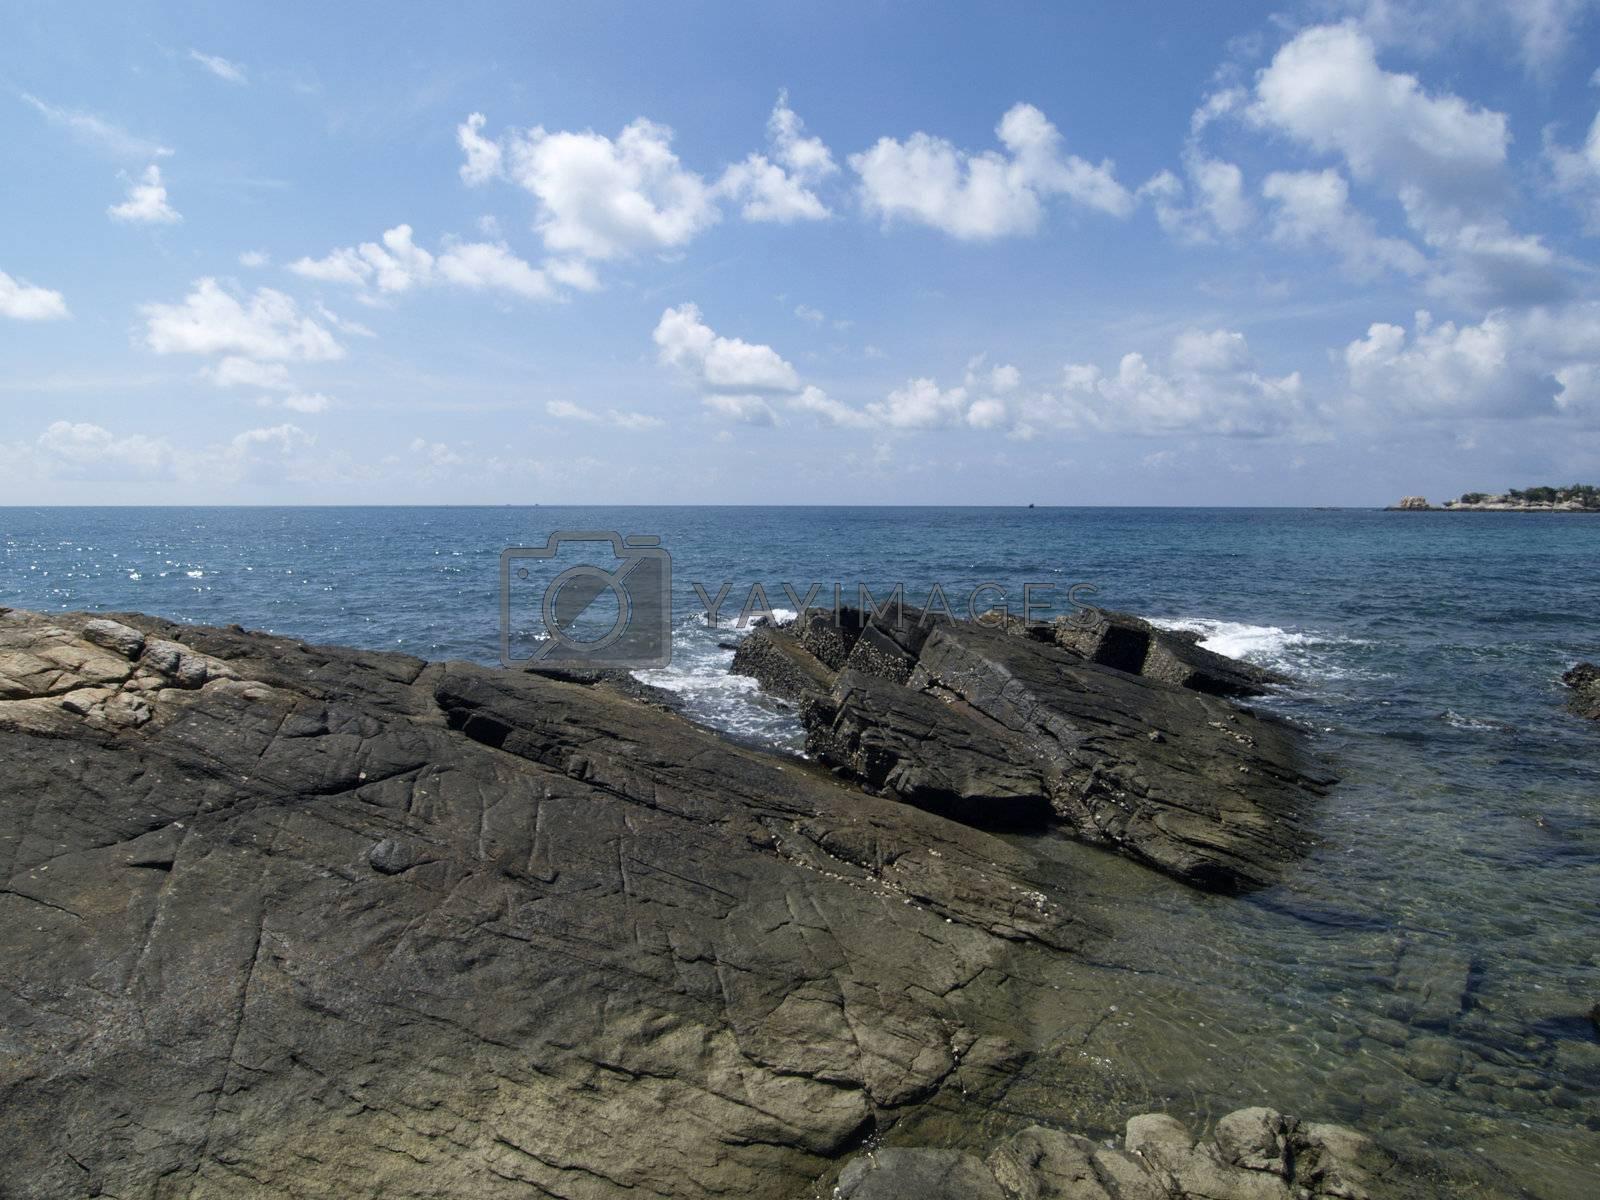 Ocean view by epixx